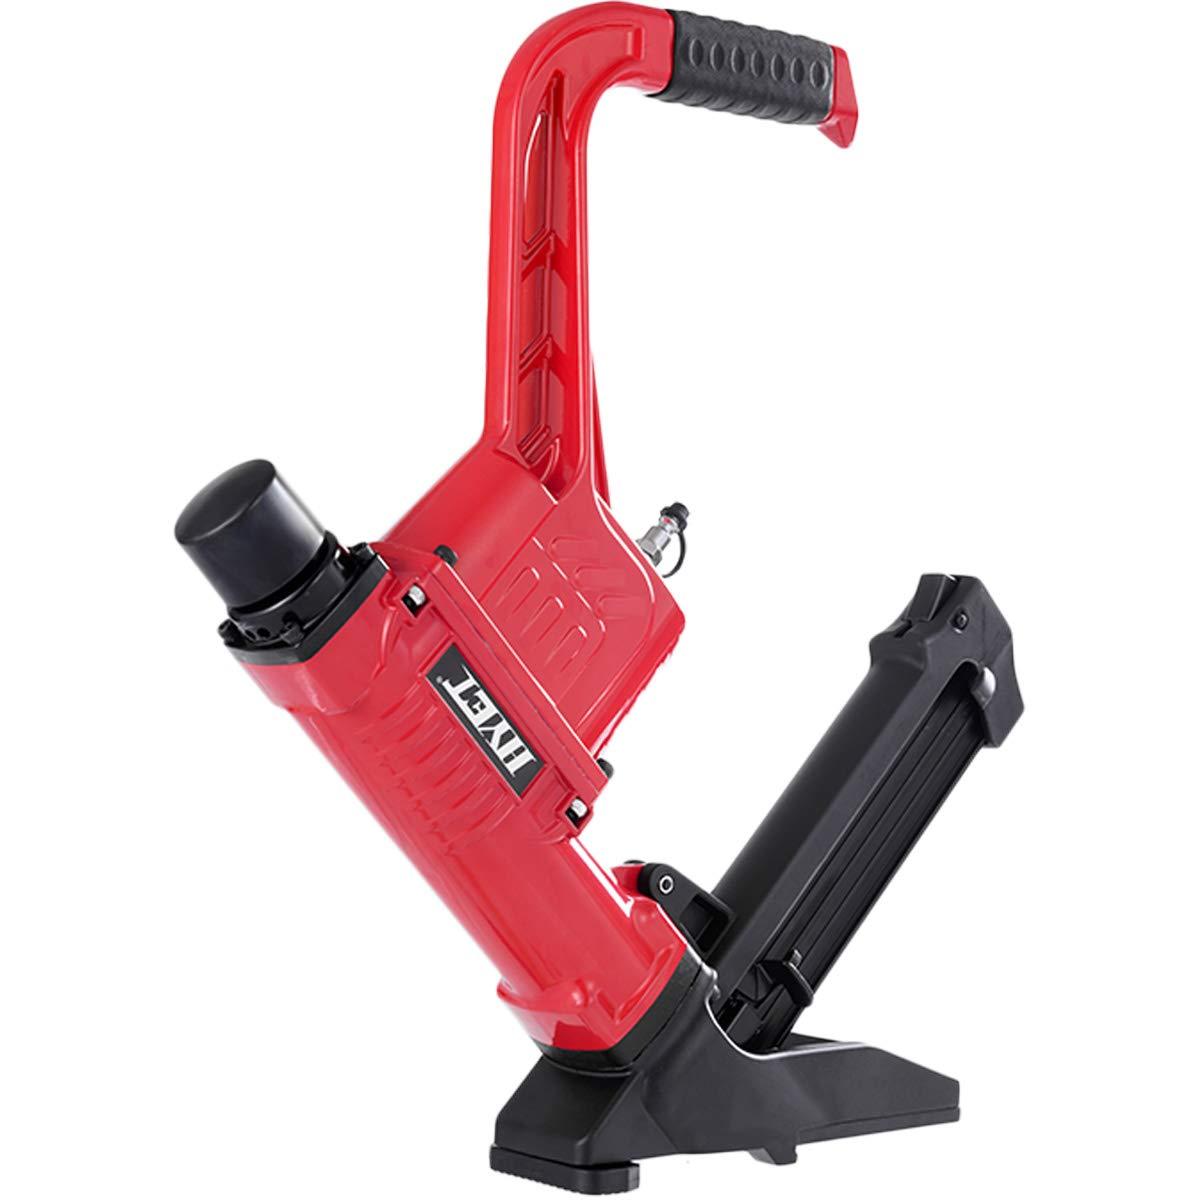 Goplus Pneumatic Flooring Nailer and Stapler 16-Gauge Cleat Air Hardwood Flooring Tool with Rubber Mallet 3-in-1